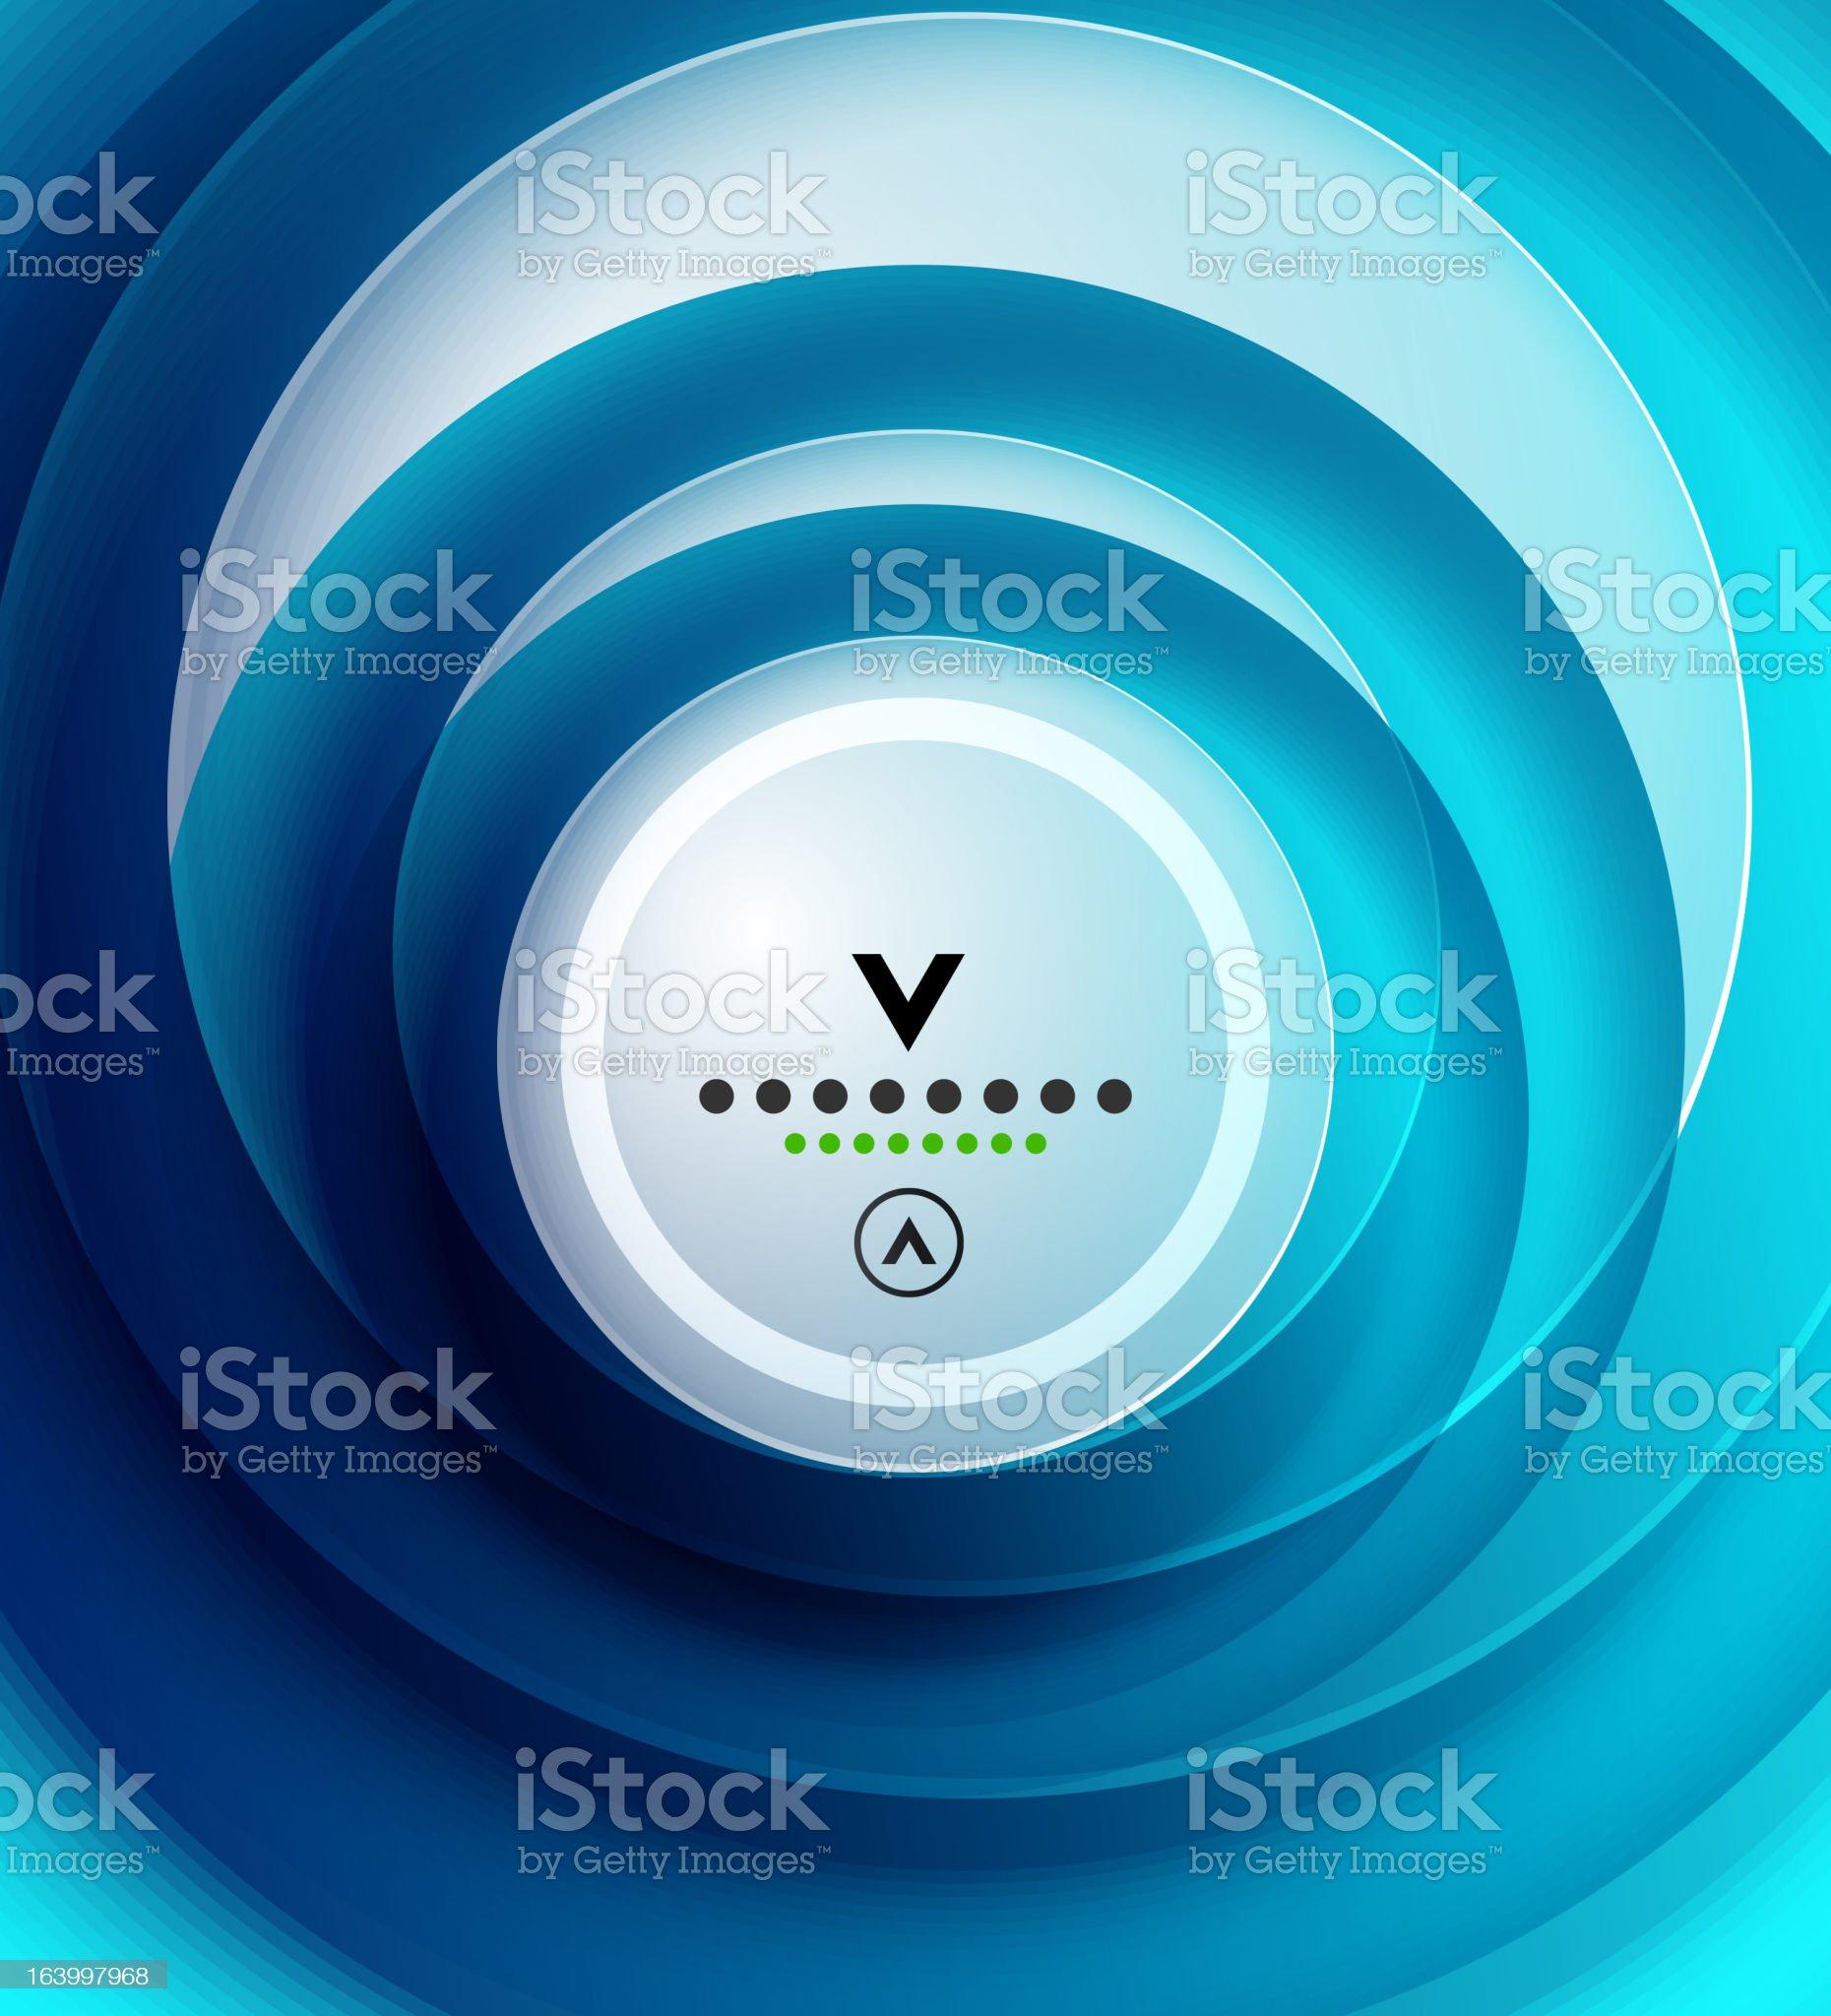 Vector blue swirl background royalty-free stock vector art